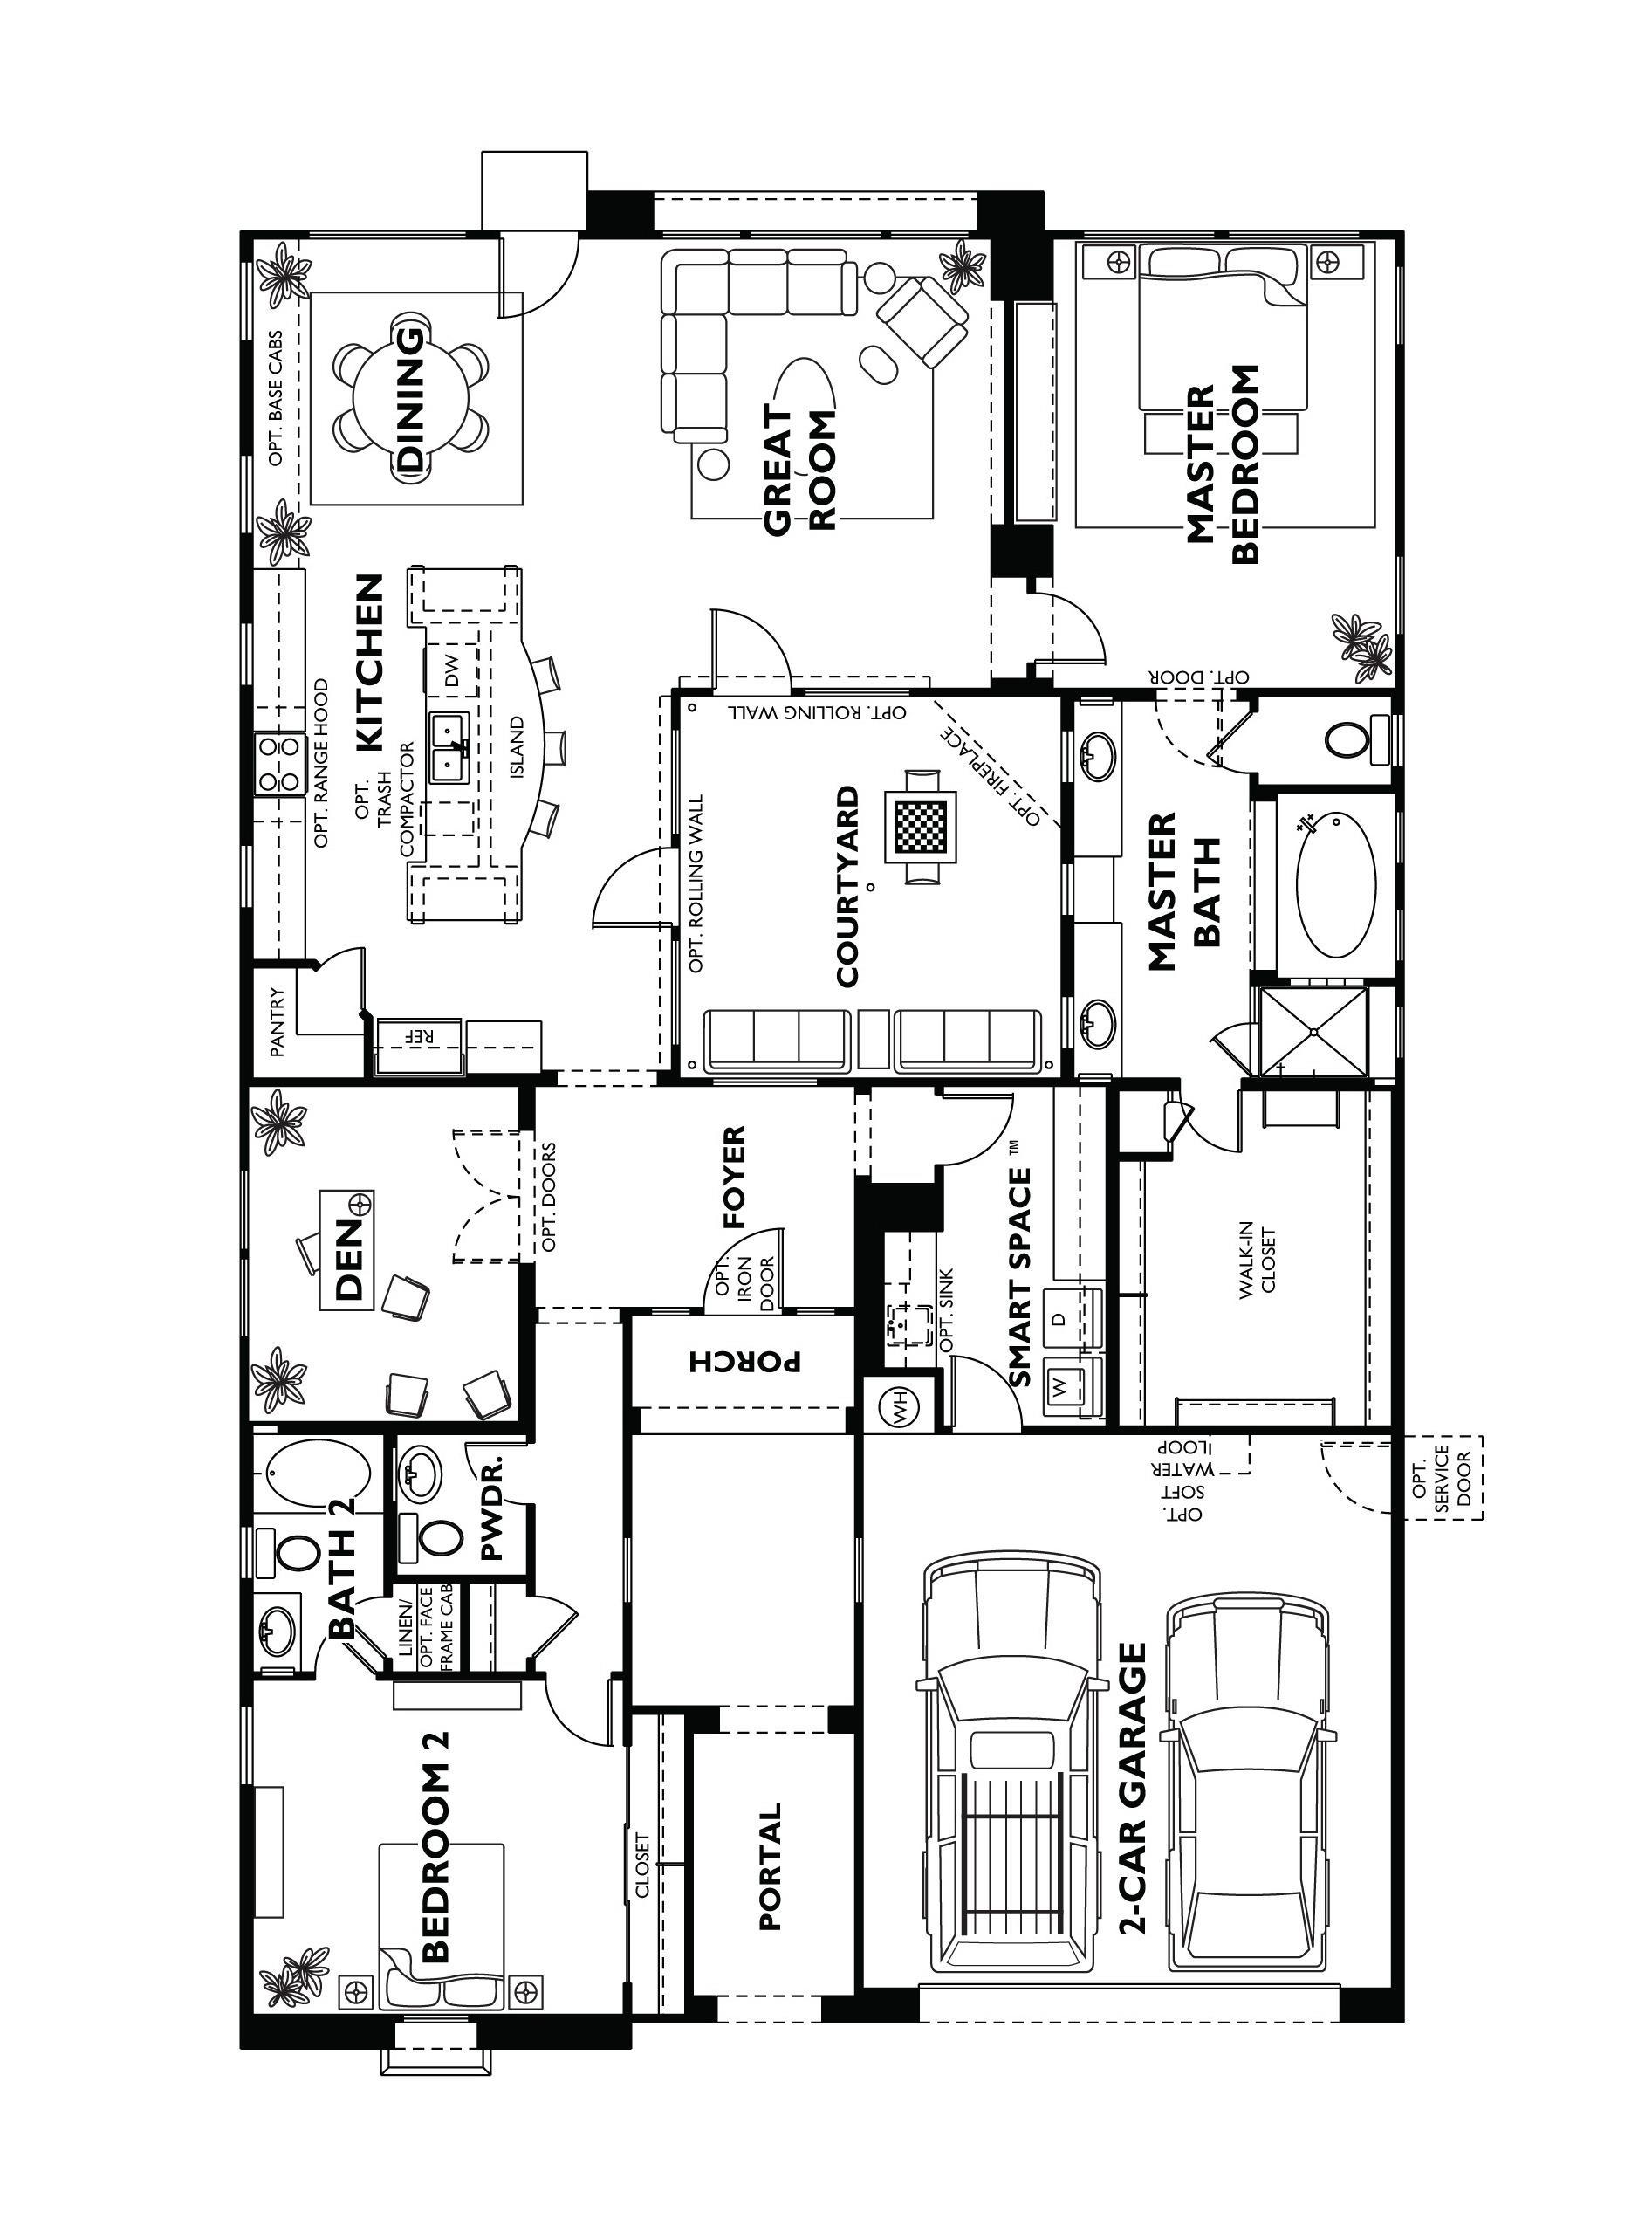 Unique custom home floor plans house floor ideas for Shea custom home plans